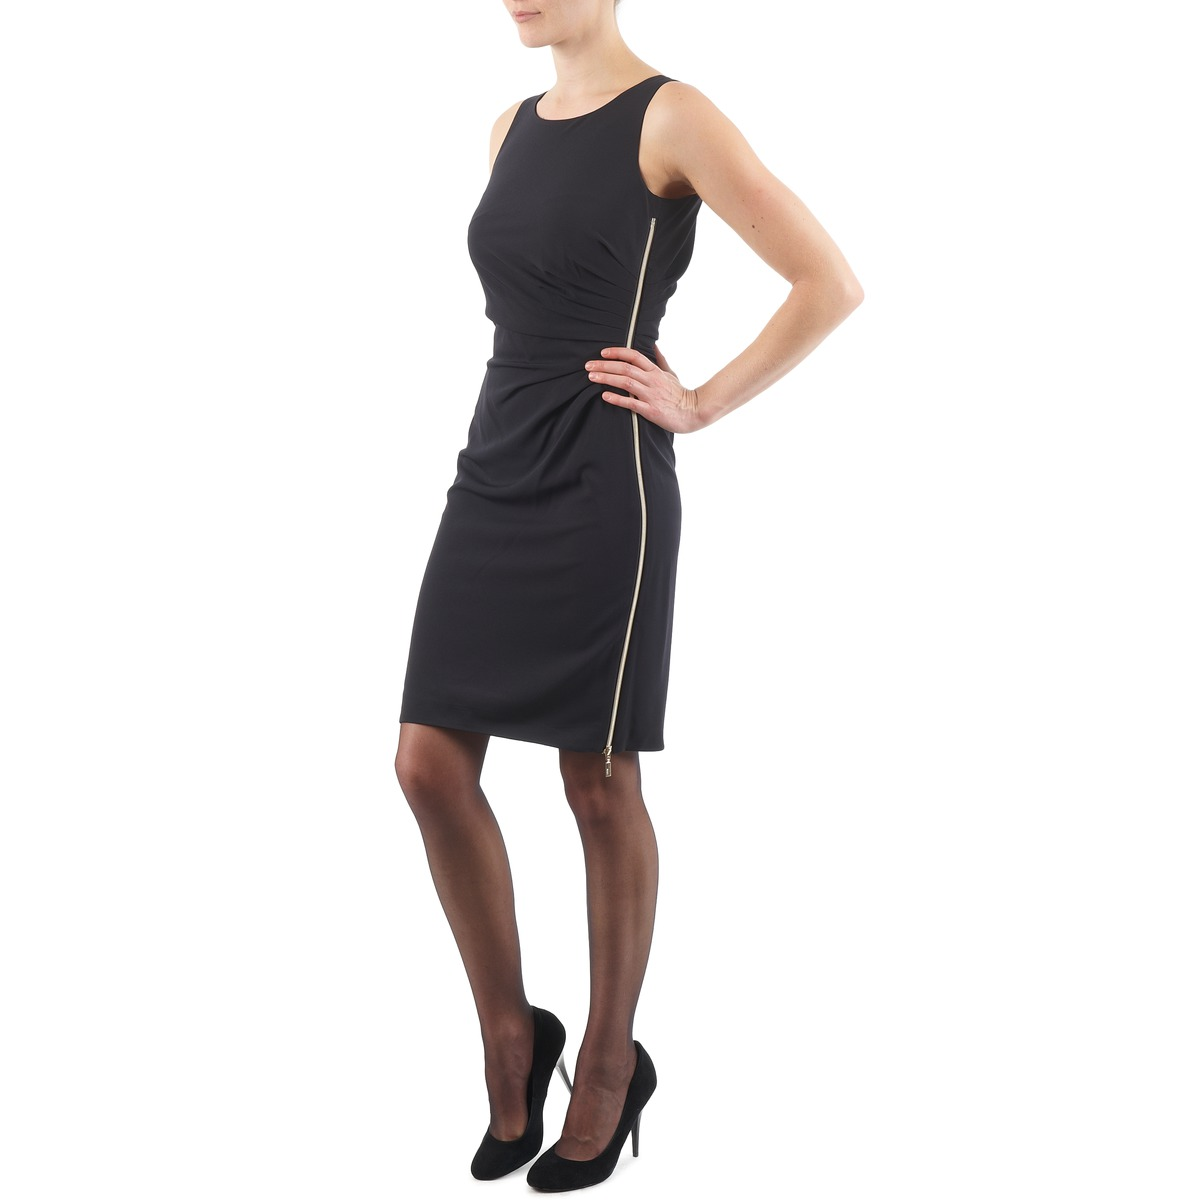 ccd5f76a612c Κοντά Φορέματα Esprit BEVERLY CREPE Σύνθεση  Πολυεστέρας